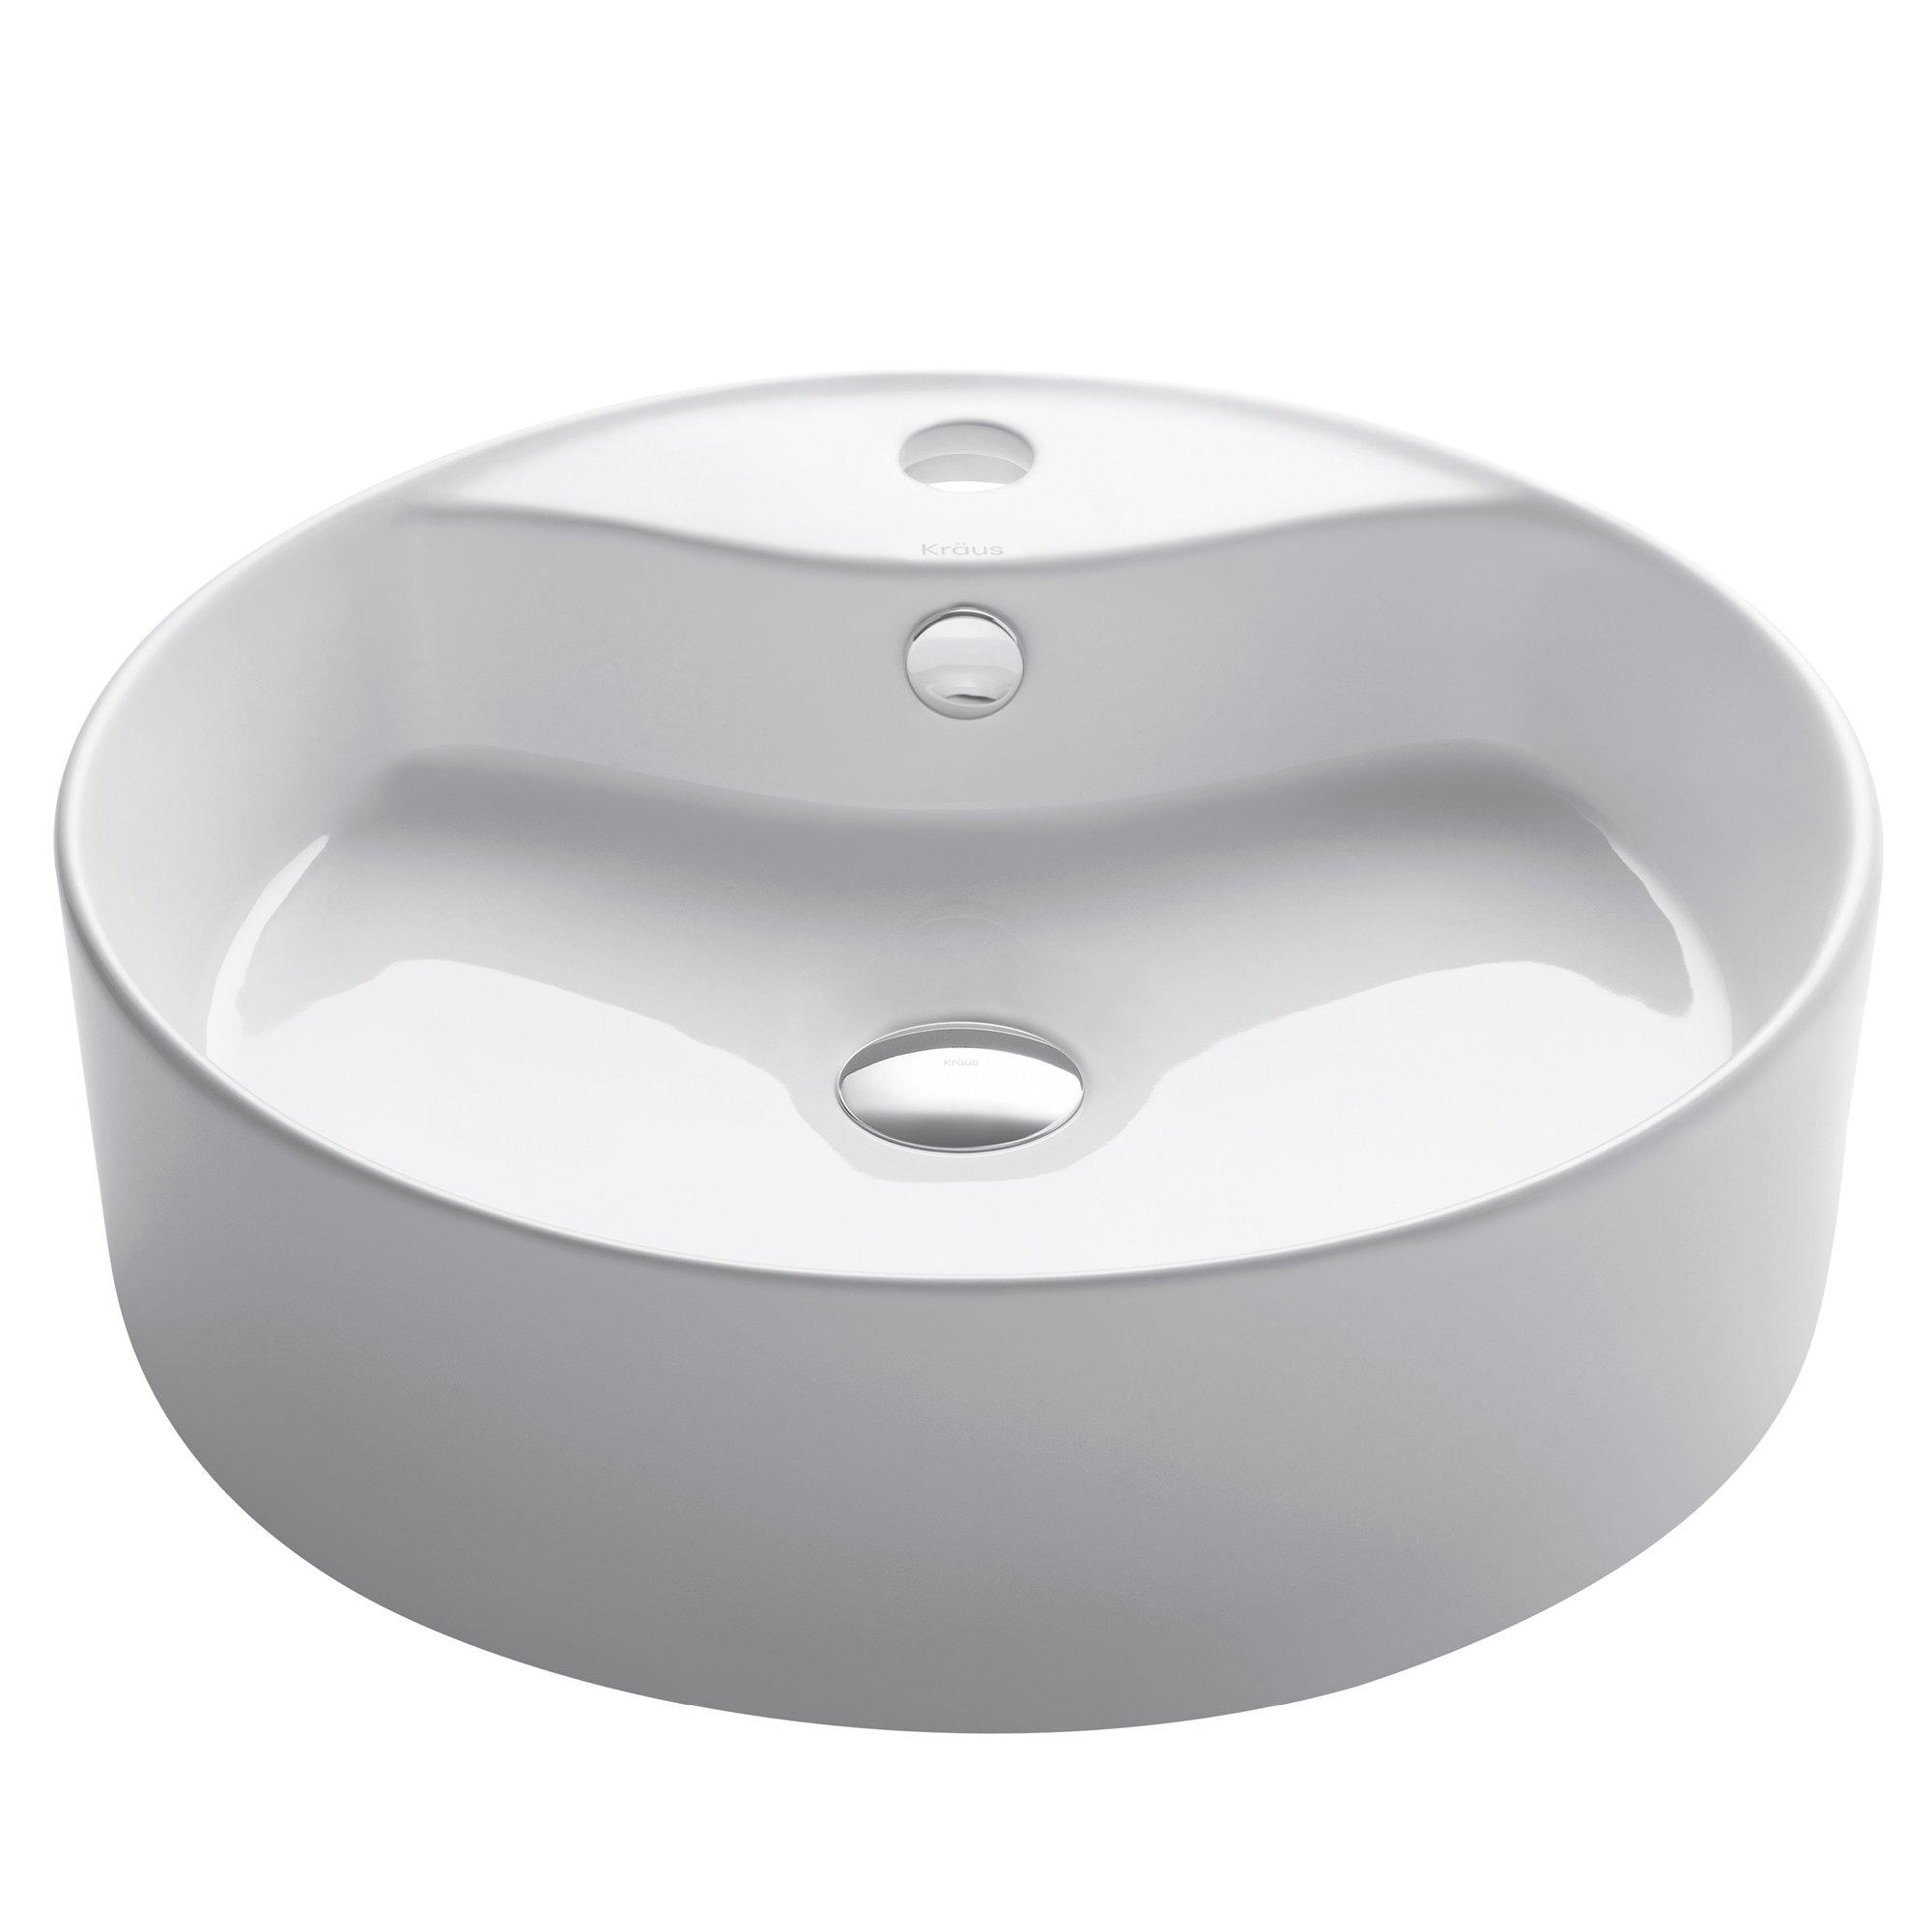 KRAUS Elavo 24-Inch Round Vessel Porcelain Ceramic Bathroom Sink in White with Overflow, KCU-261